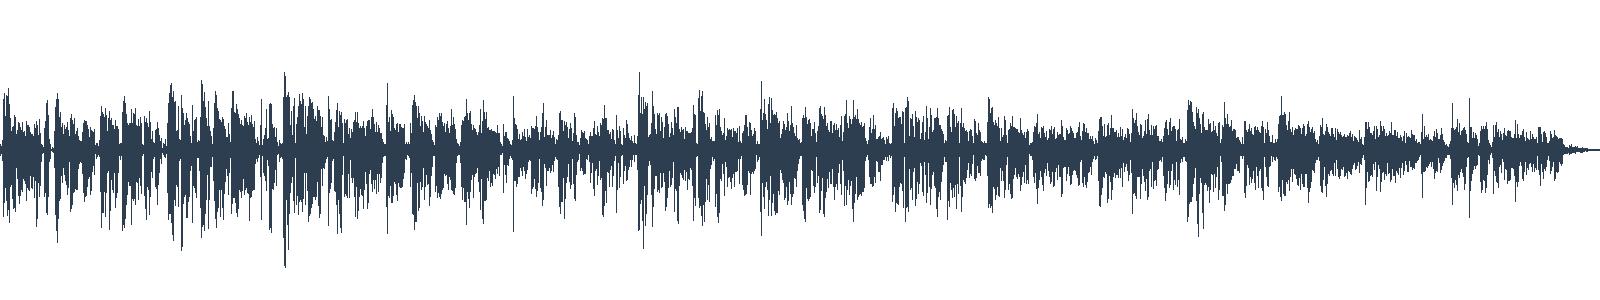 Nové audioknihy 6/2019 waveform